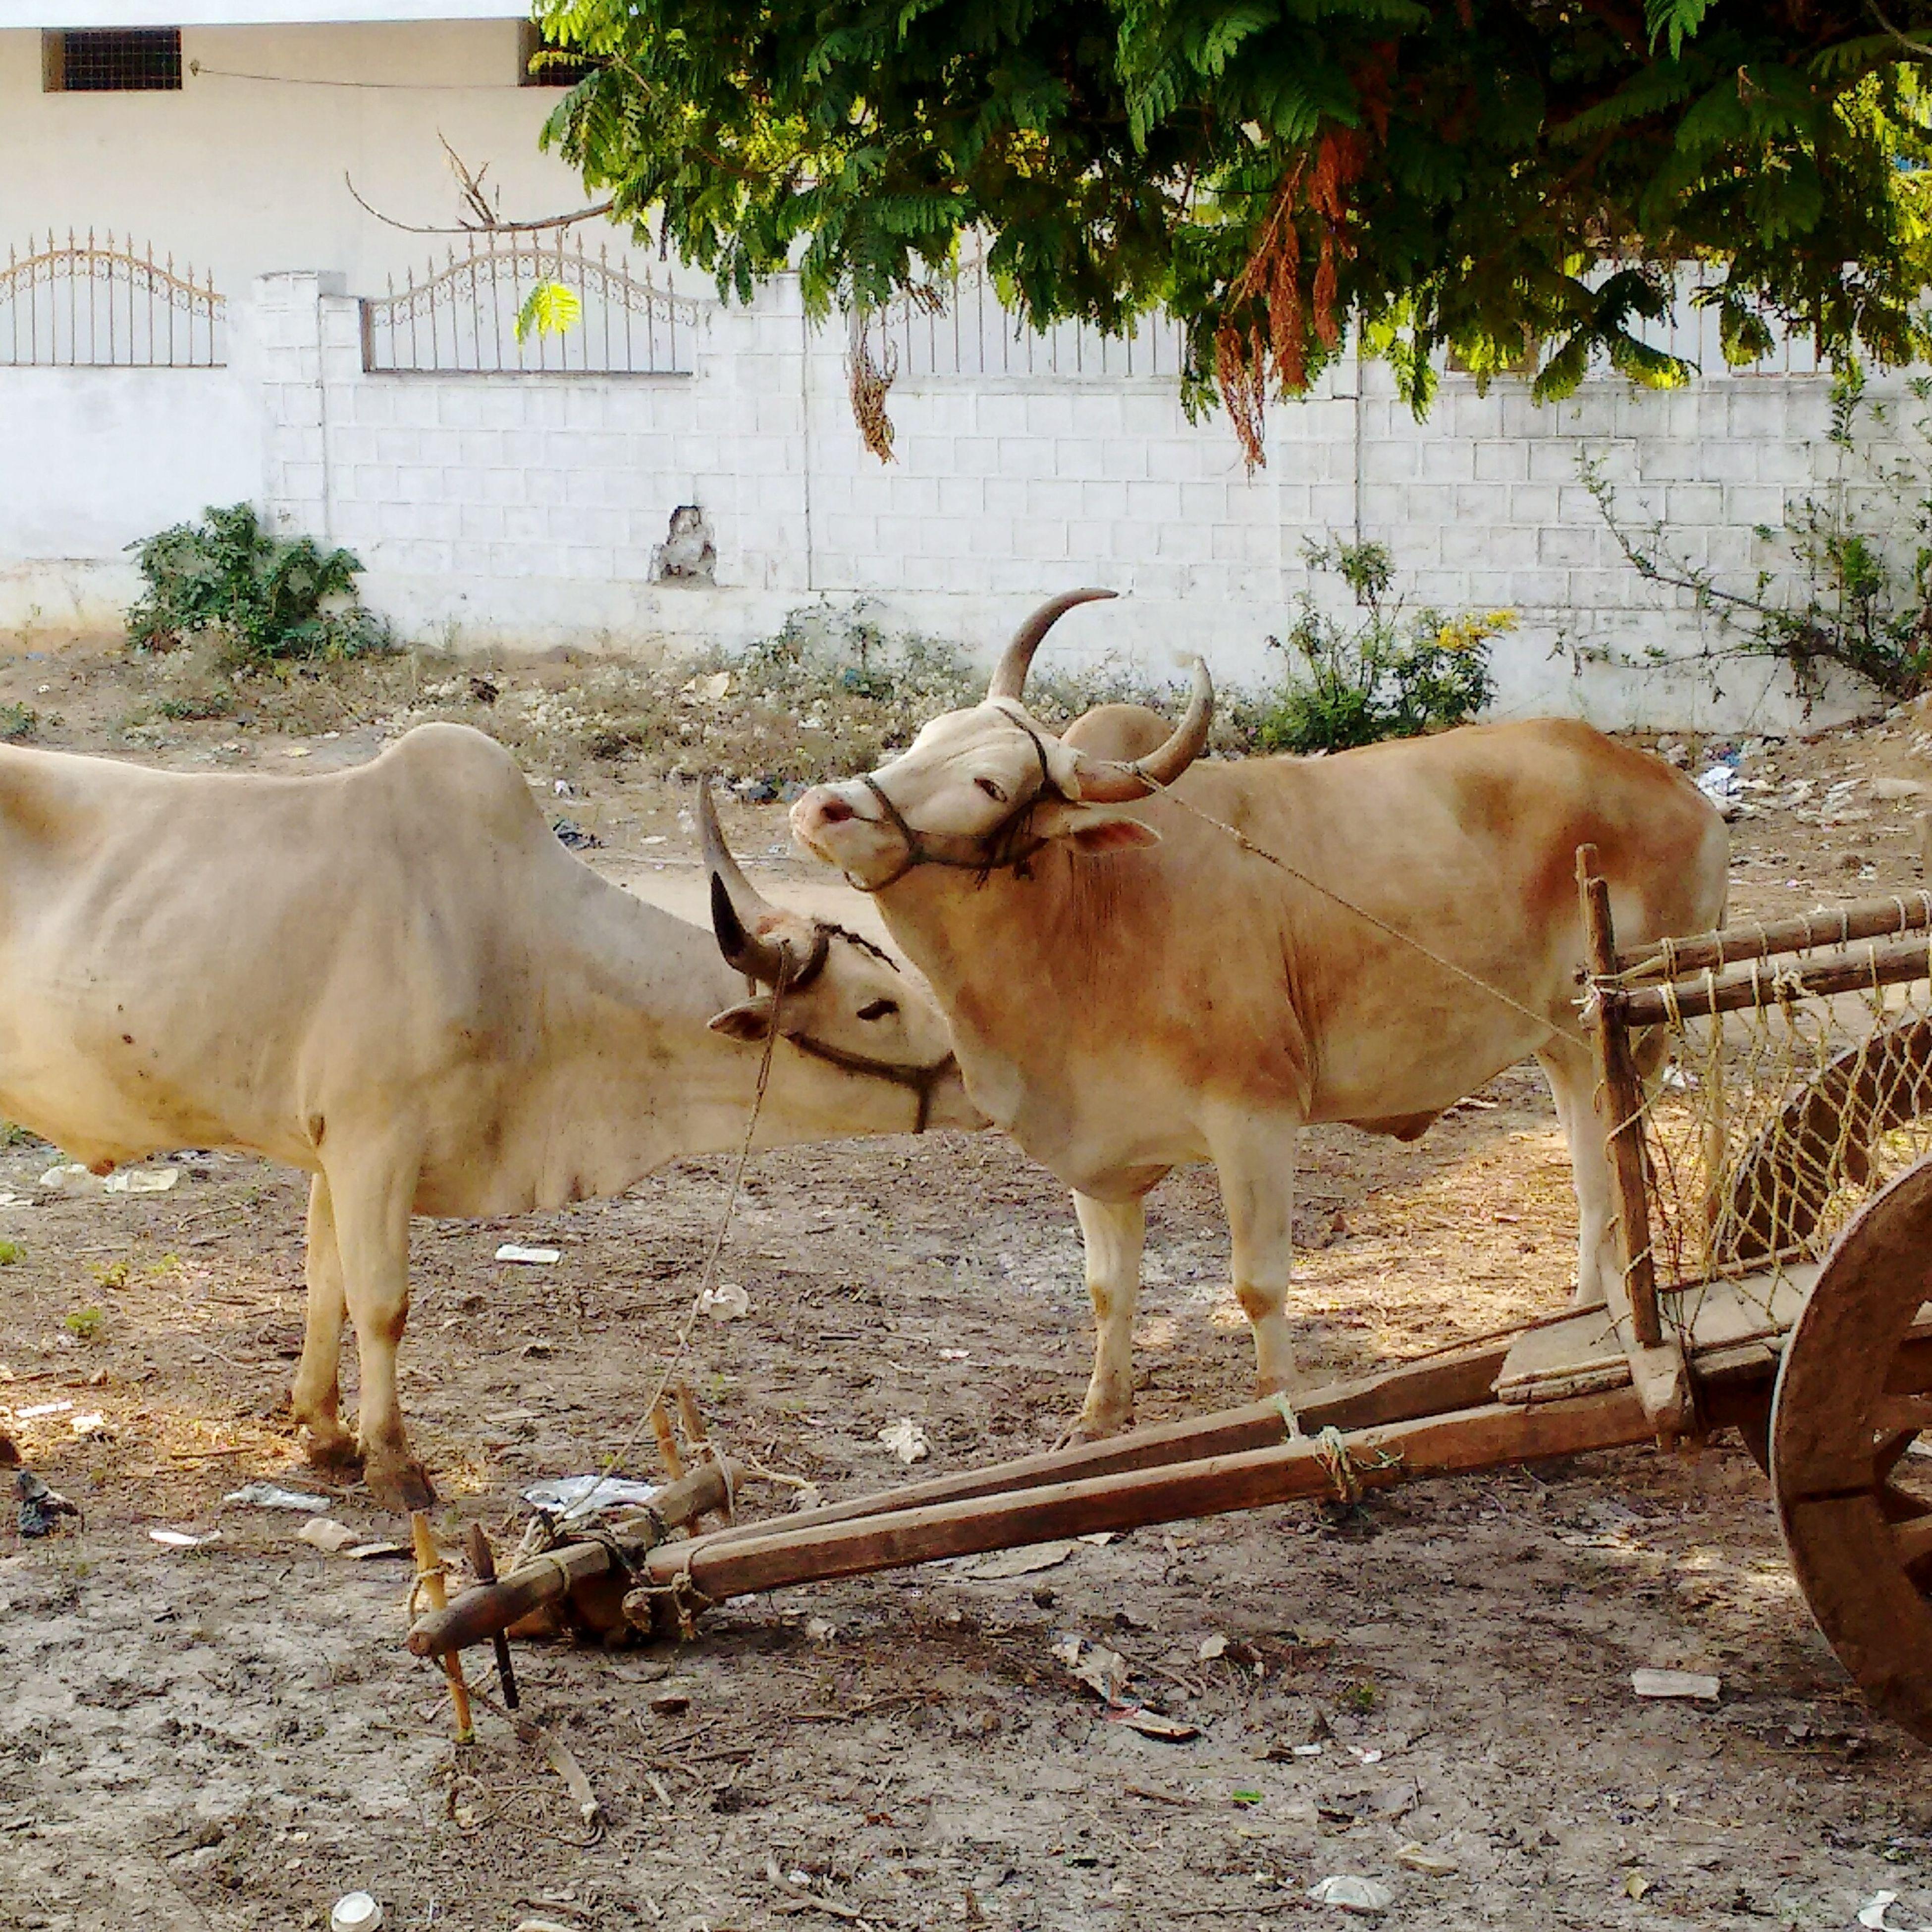 Q Taking Photos Animal Love Animal Photography Bulls Animals Share Love Indianphotography Indiancountryside